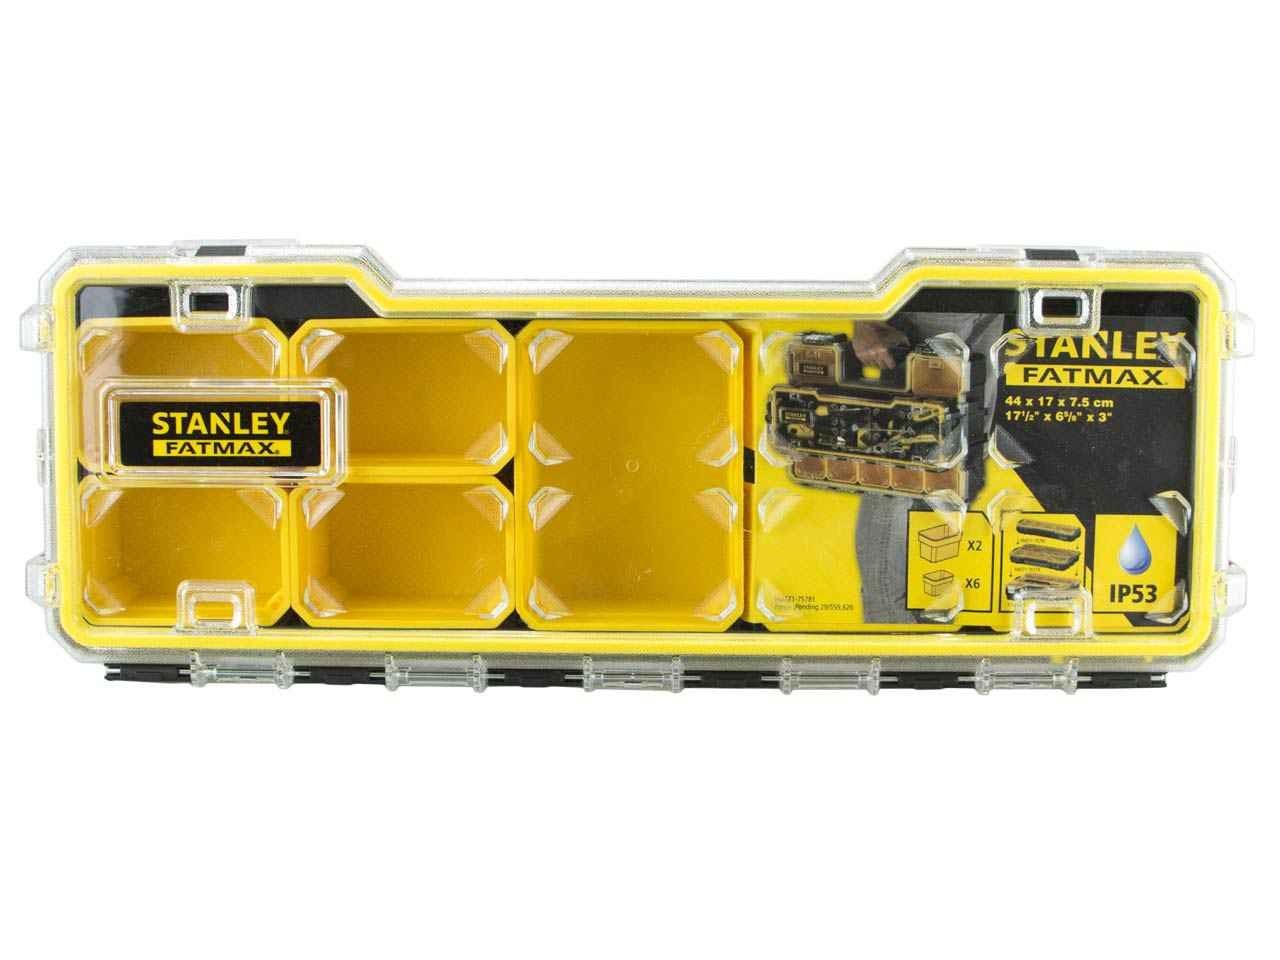 stanley sta175781 fatmax pro 1 3 shallow organiser. Black Bedroom Furniture Sets. Home Design Ideas